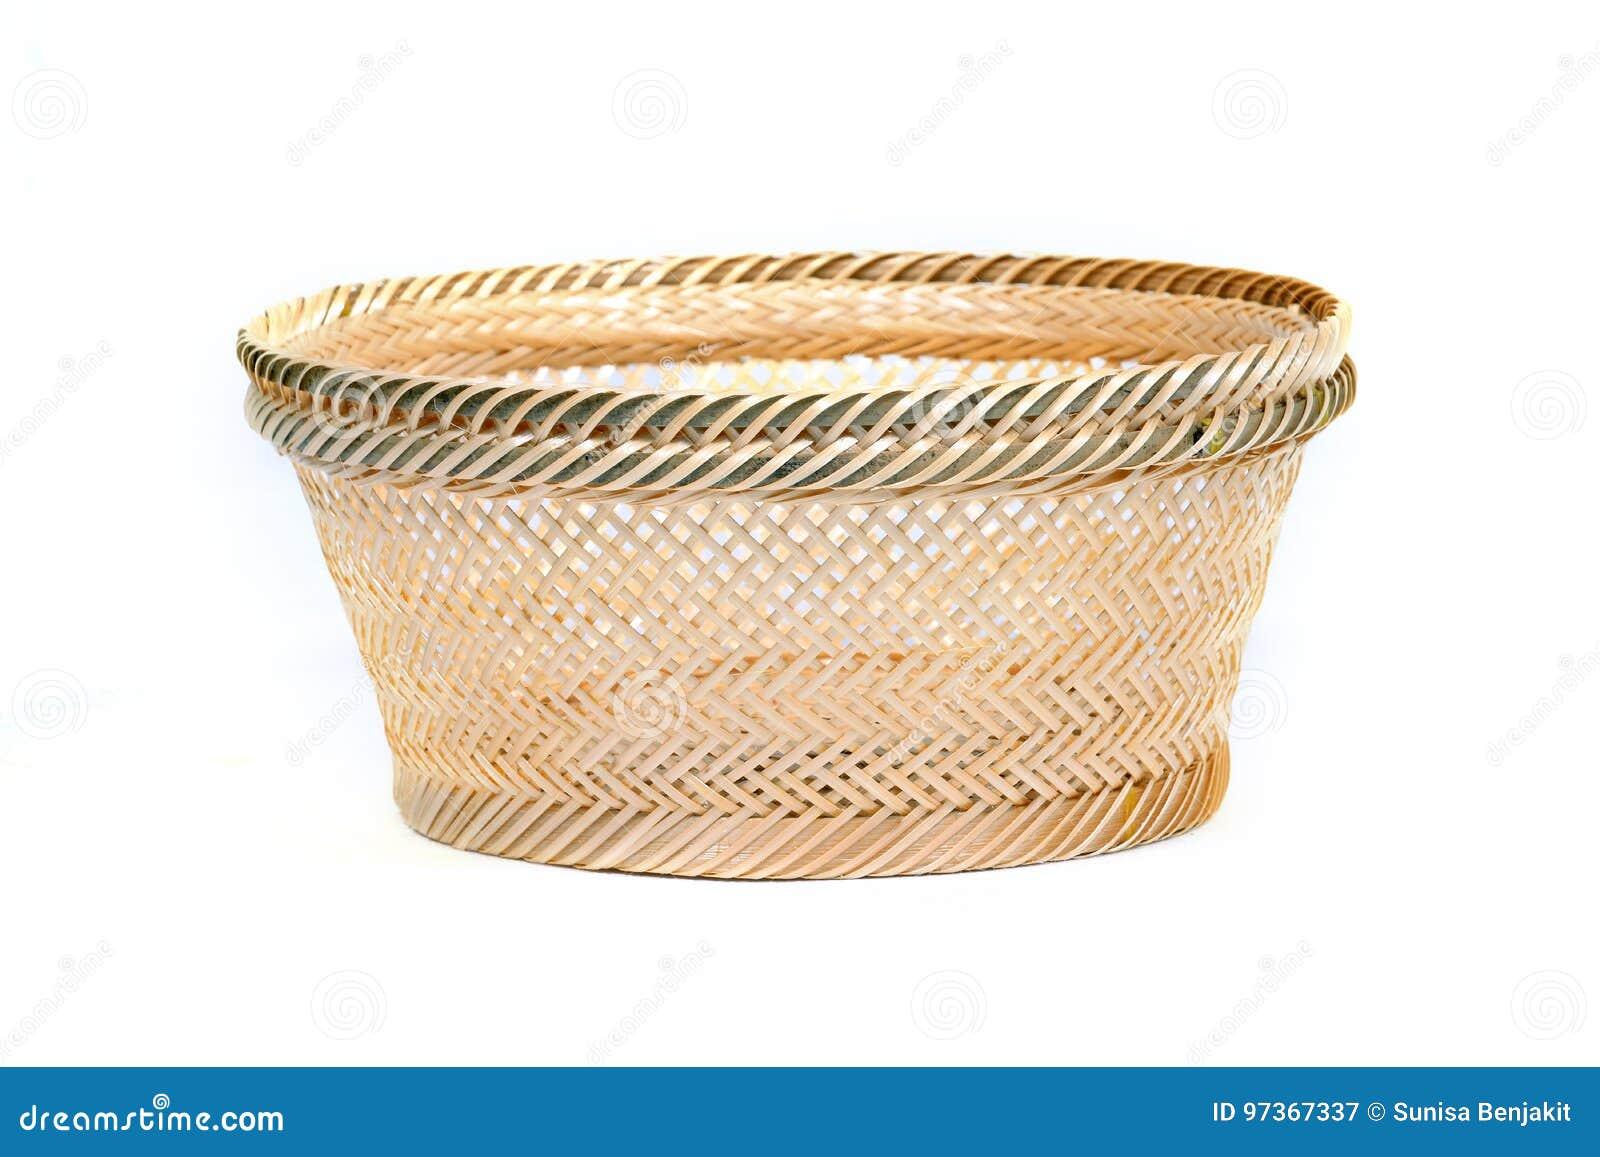 Korb Gebildet Vom Bambus Stockbild Bild Von Rund Nave 97367337